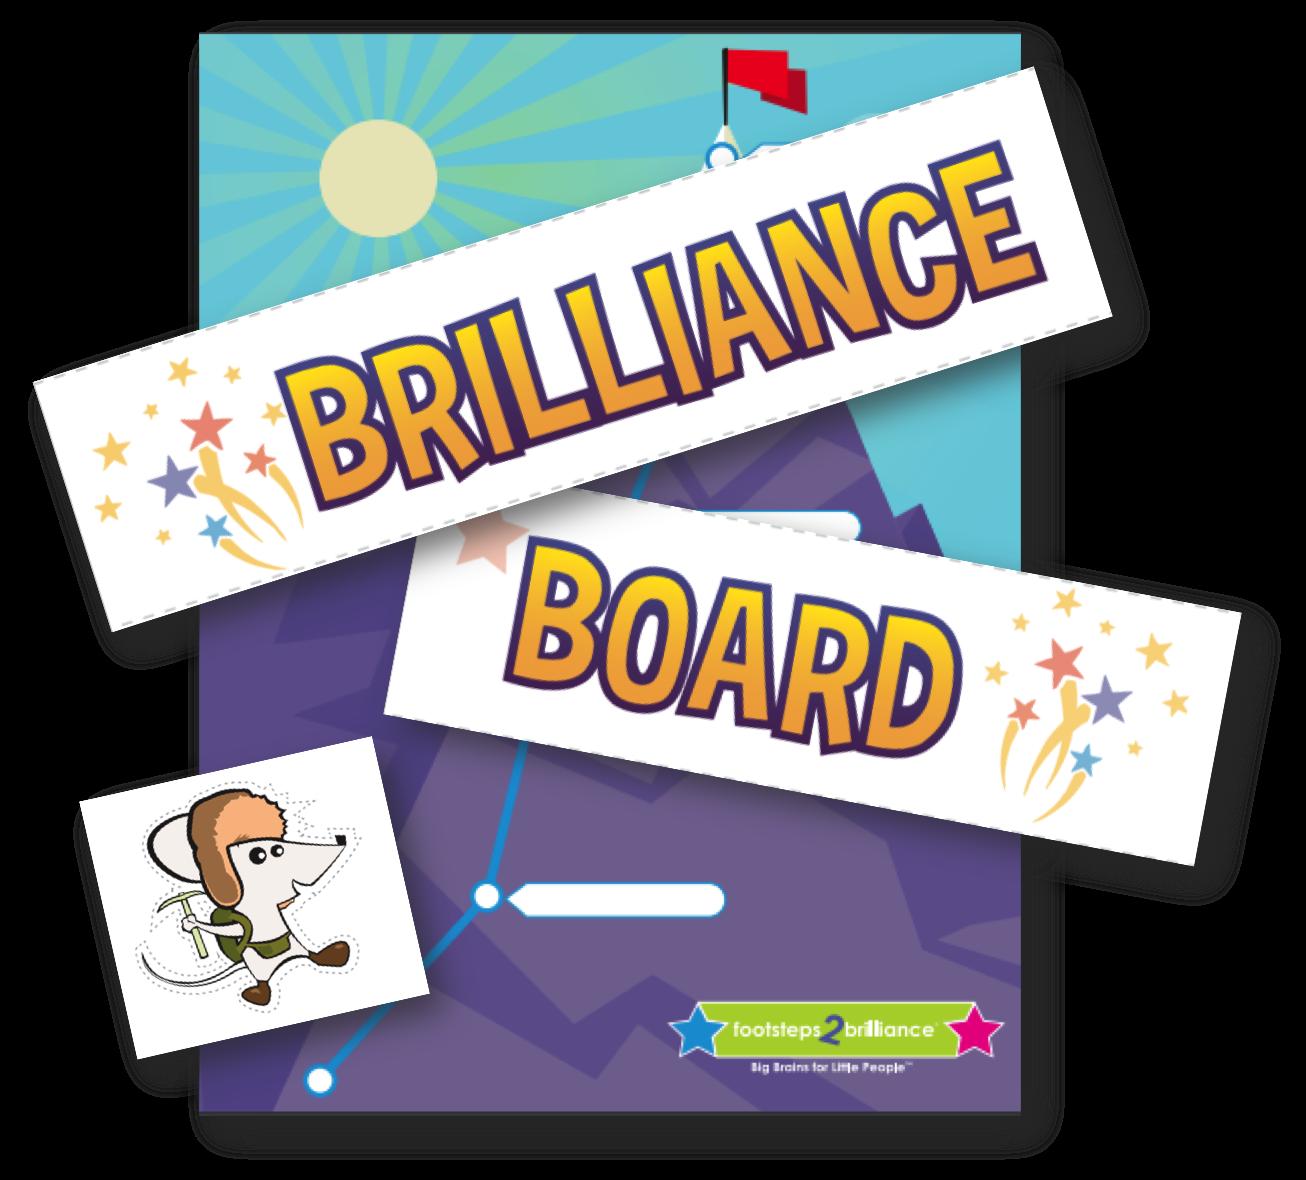 New Brilliance Board Artwork in Teacher Toolkits